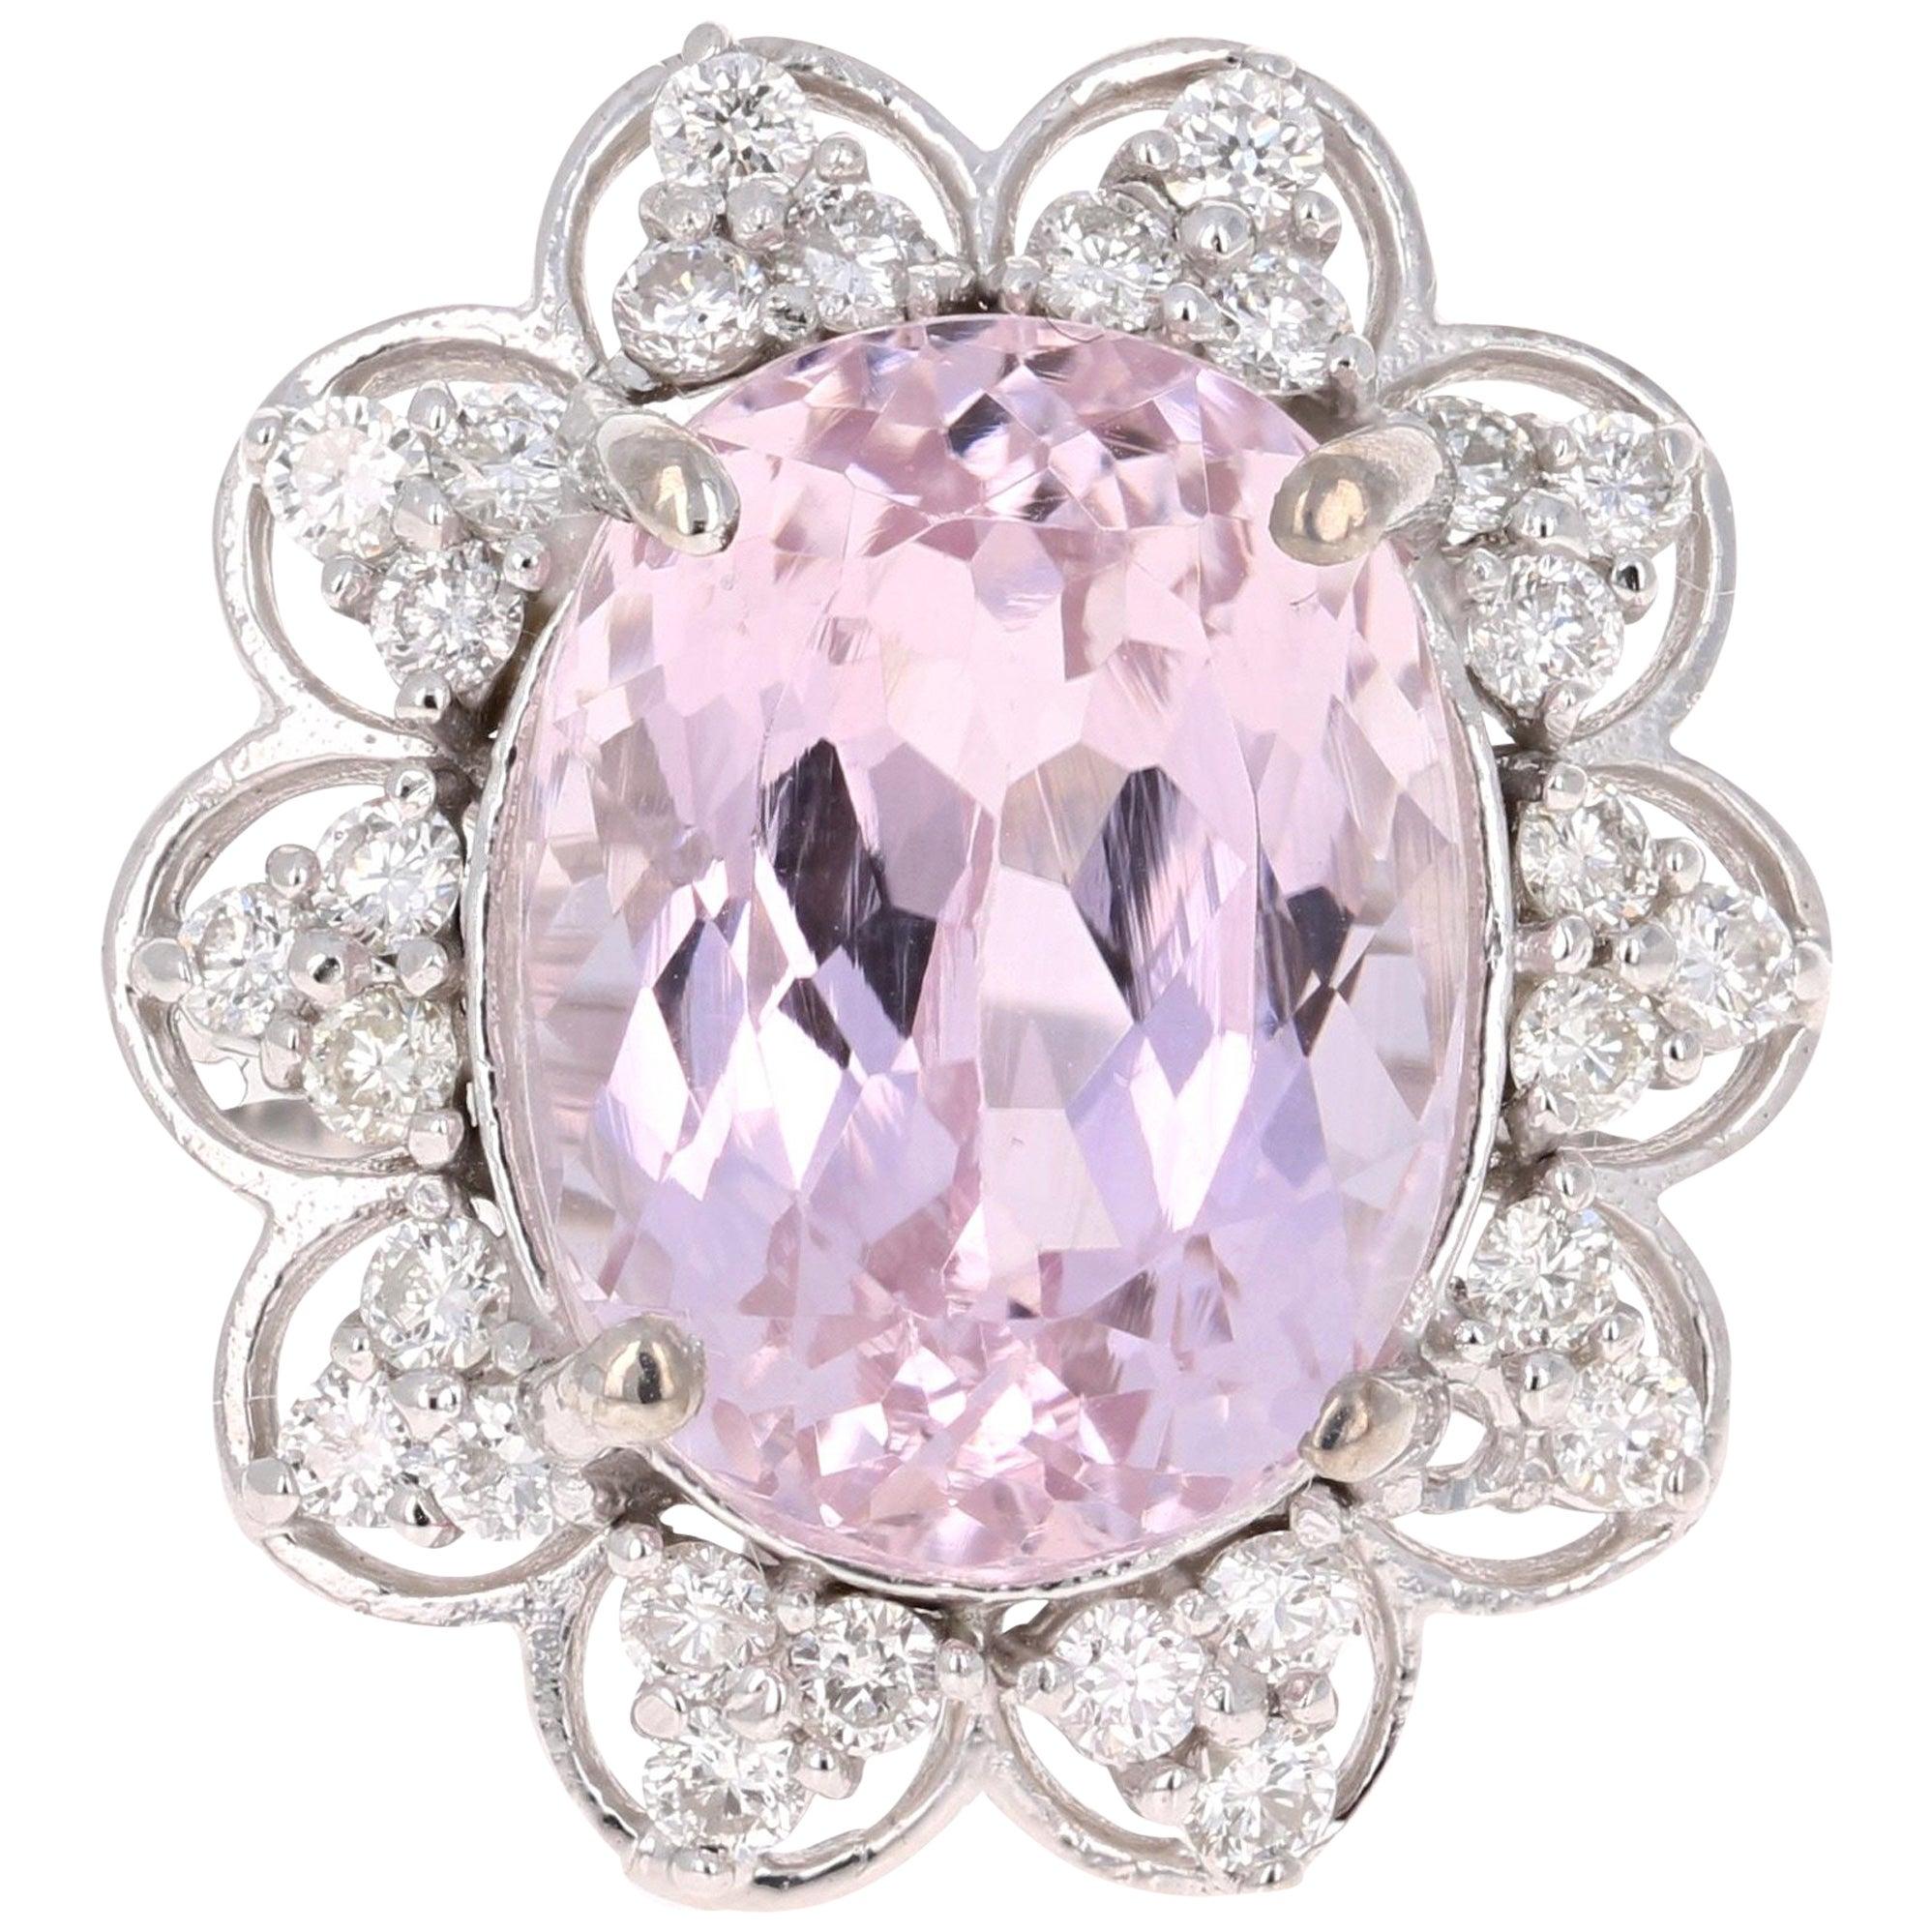 Classic Faux White Cushion Cut 10 Carat Diamond White Gold Ring at ...